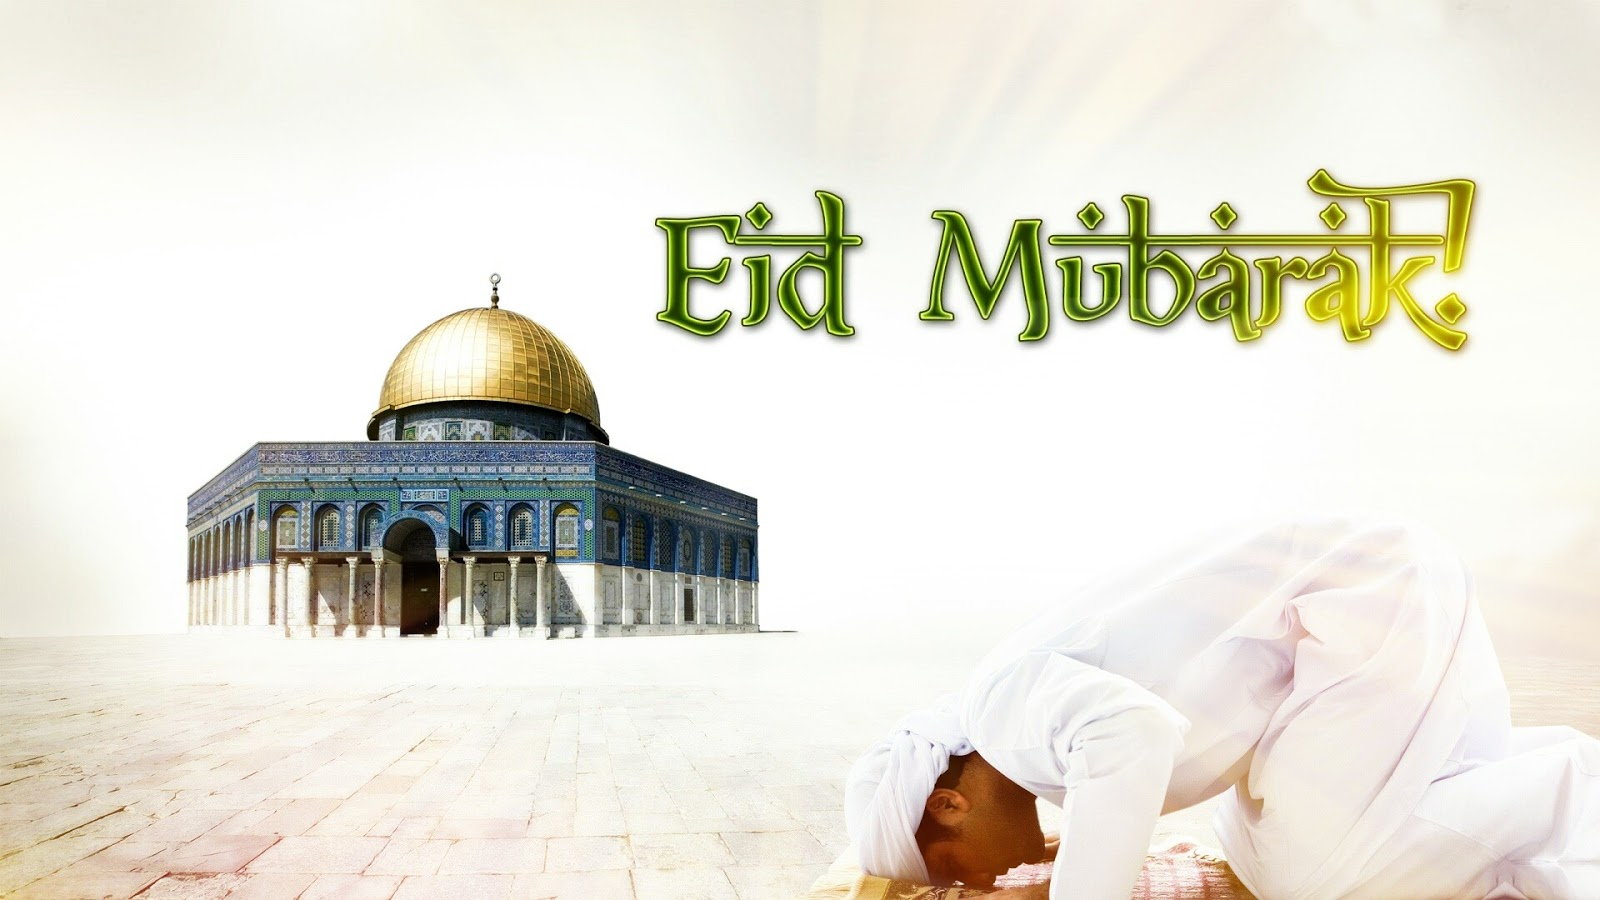 Wallpaper download 2017 - Eid Images 2017